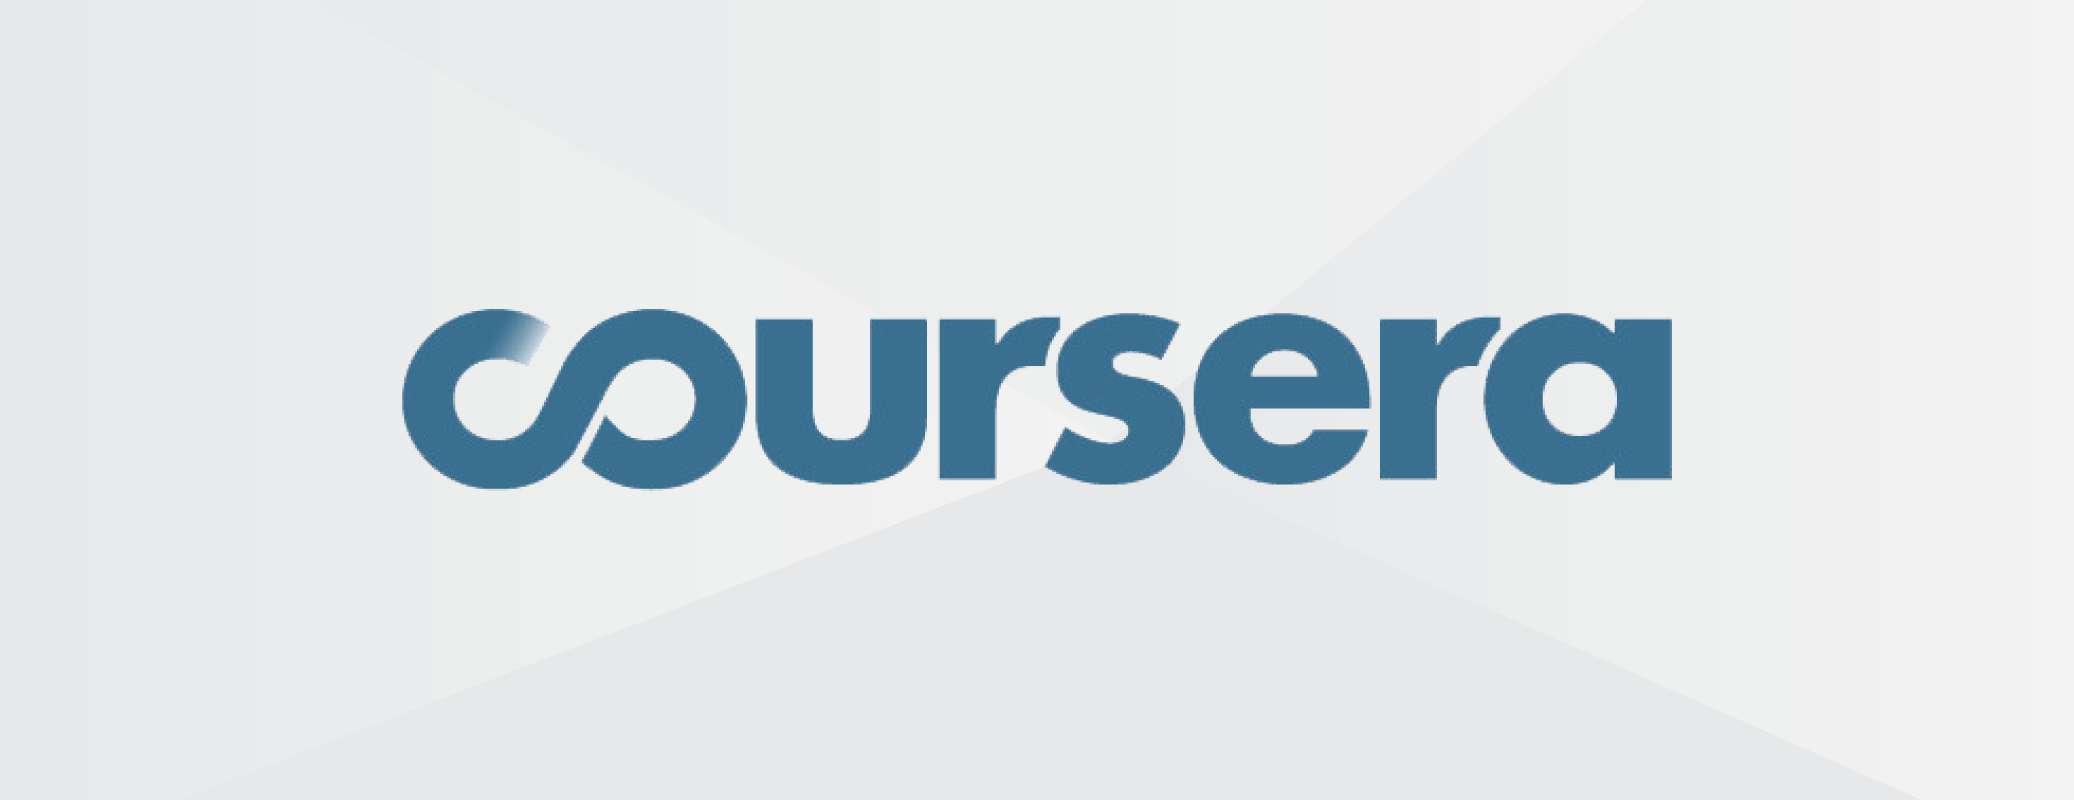 coursera-2074